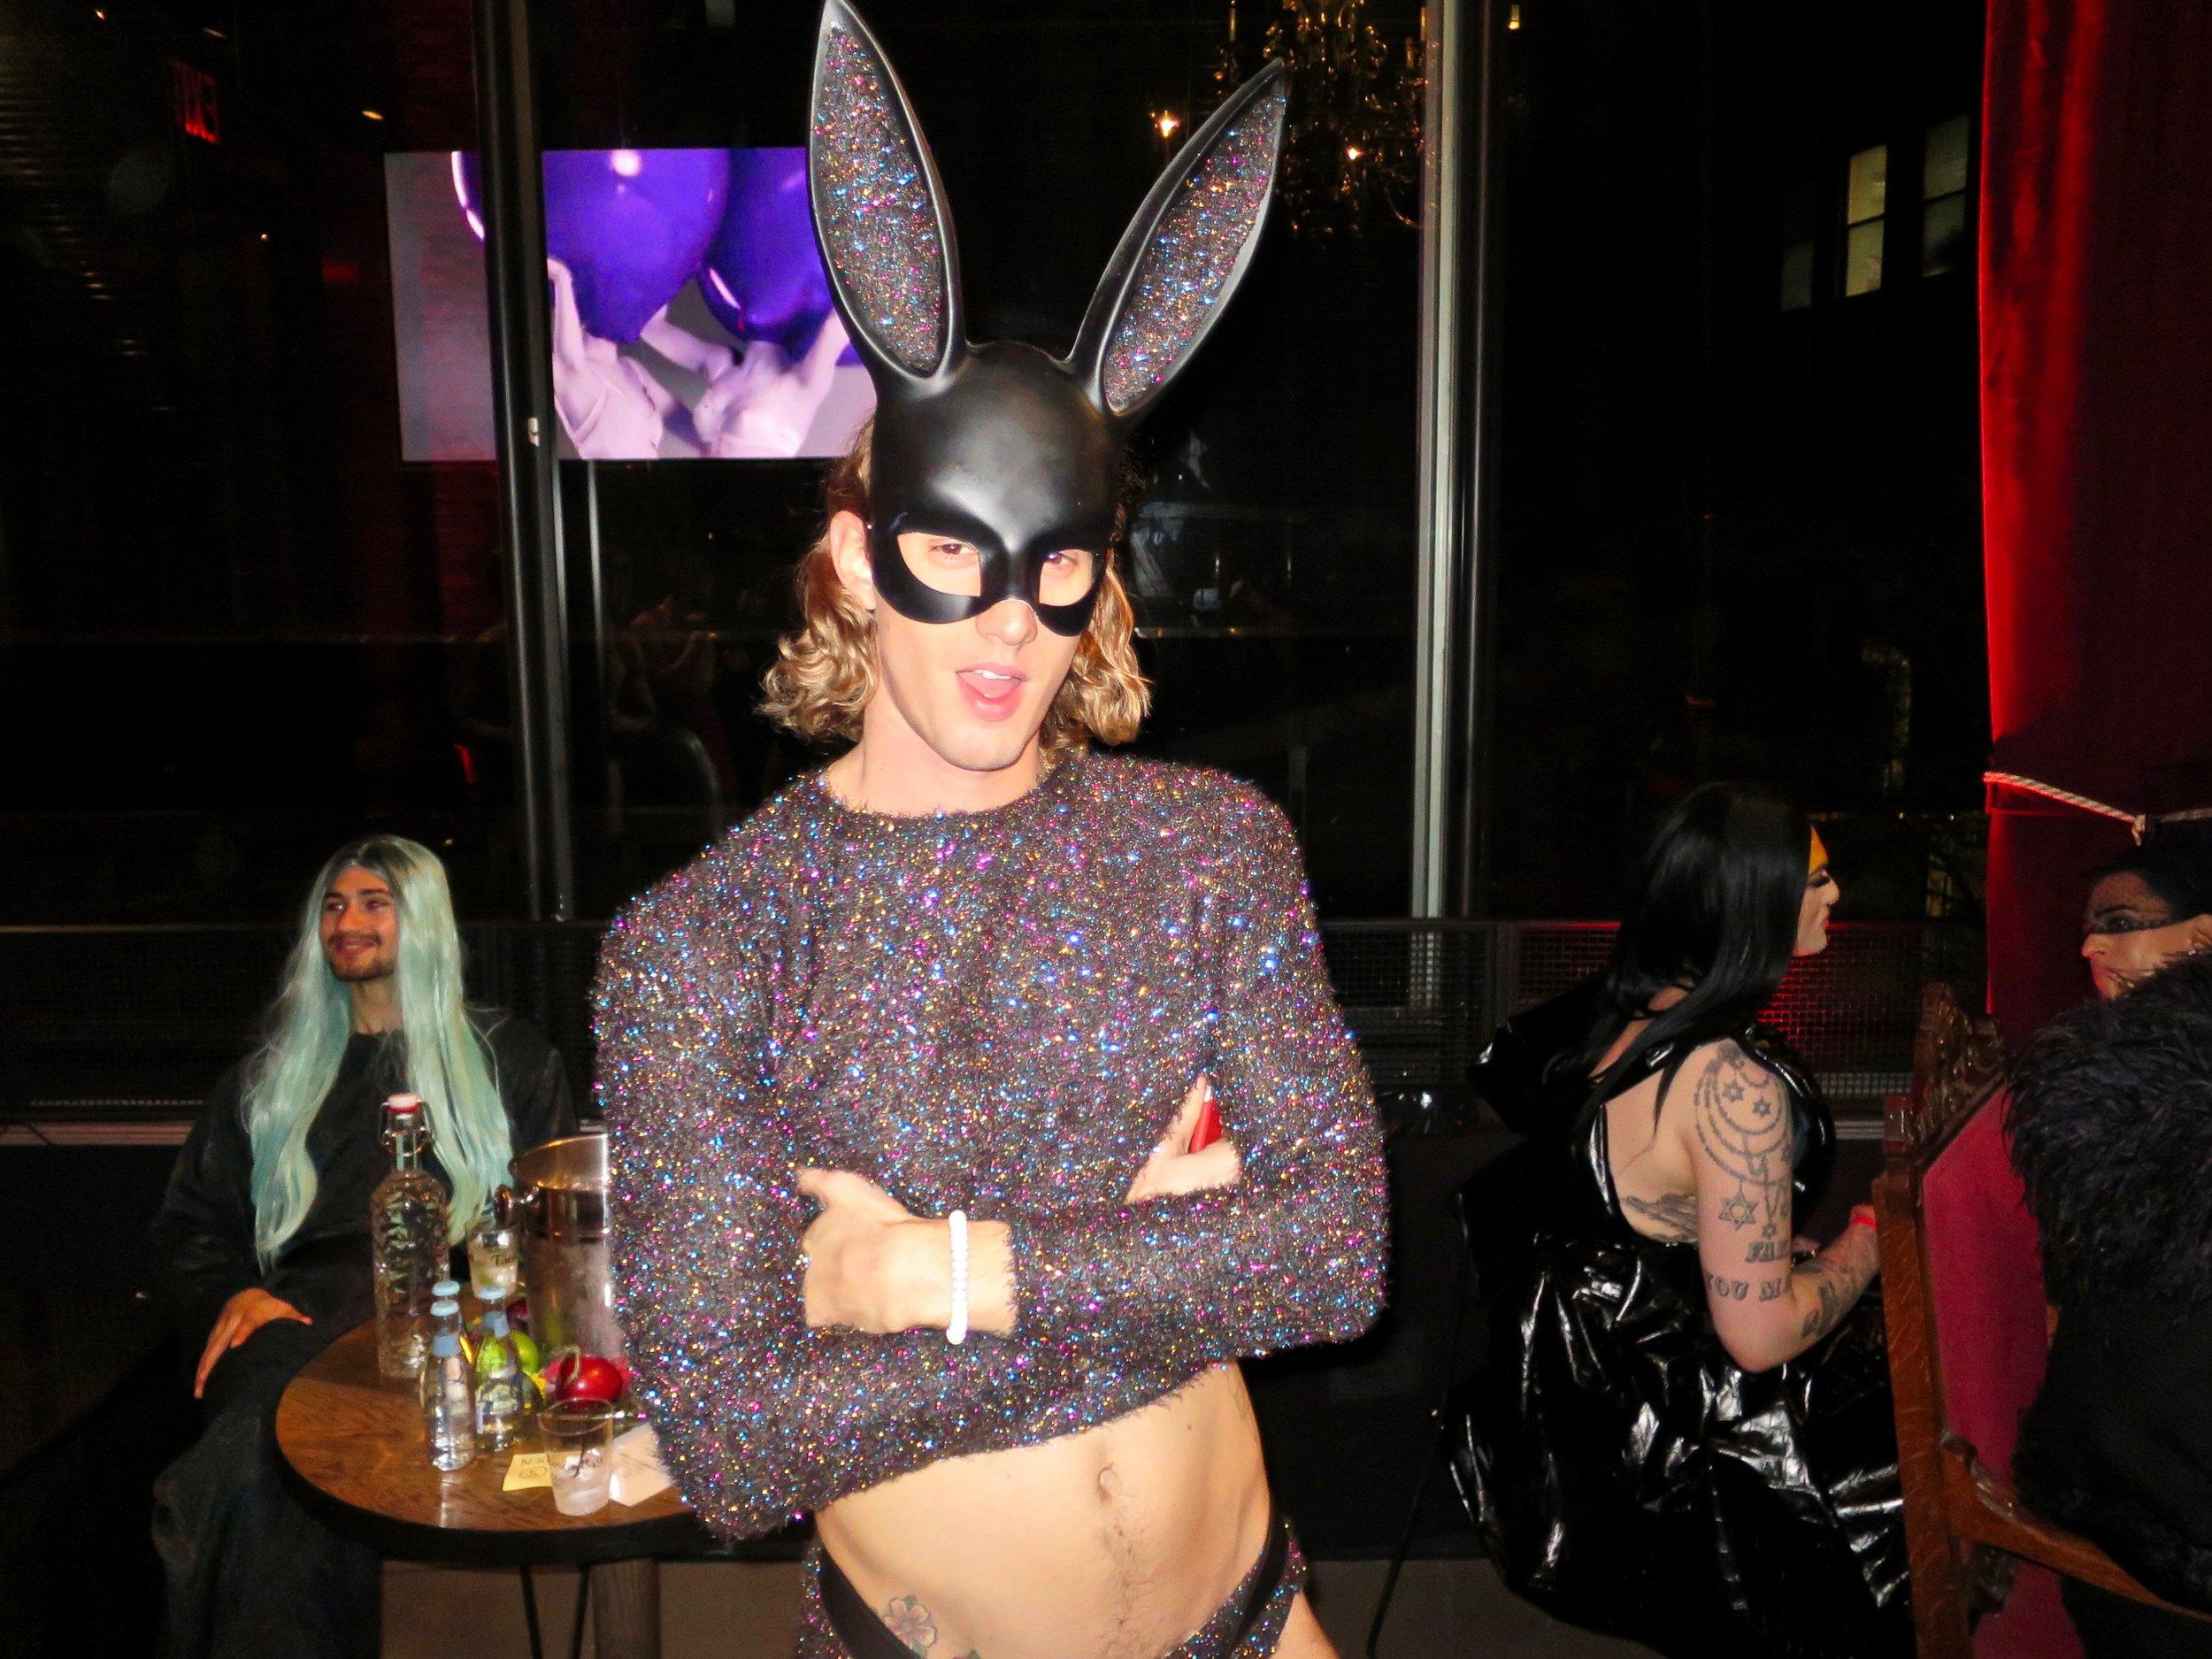 MANOR849-Playboy-02.jpg